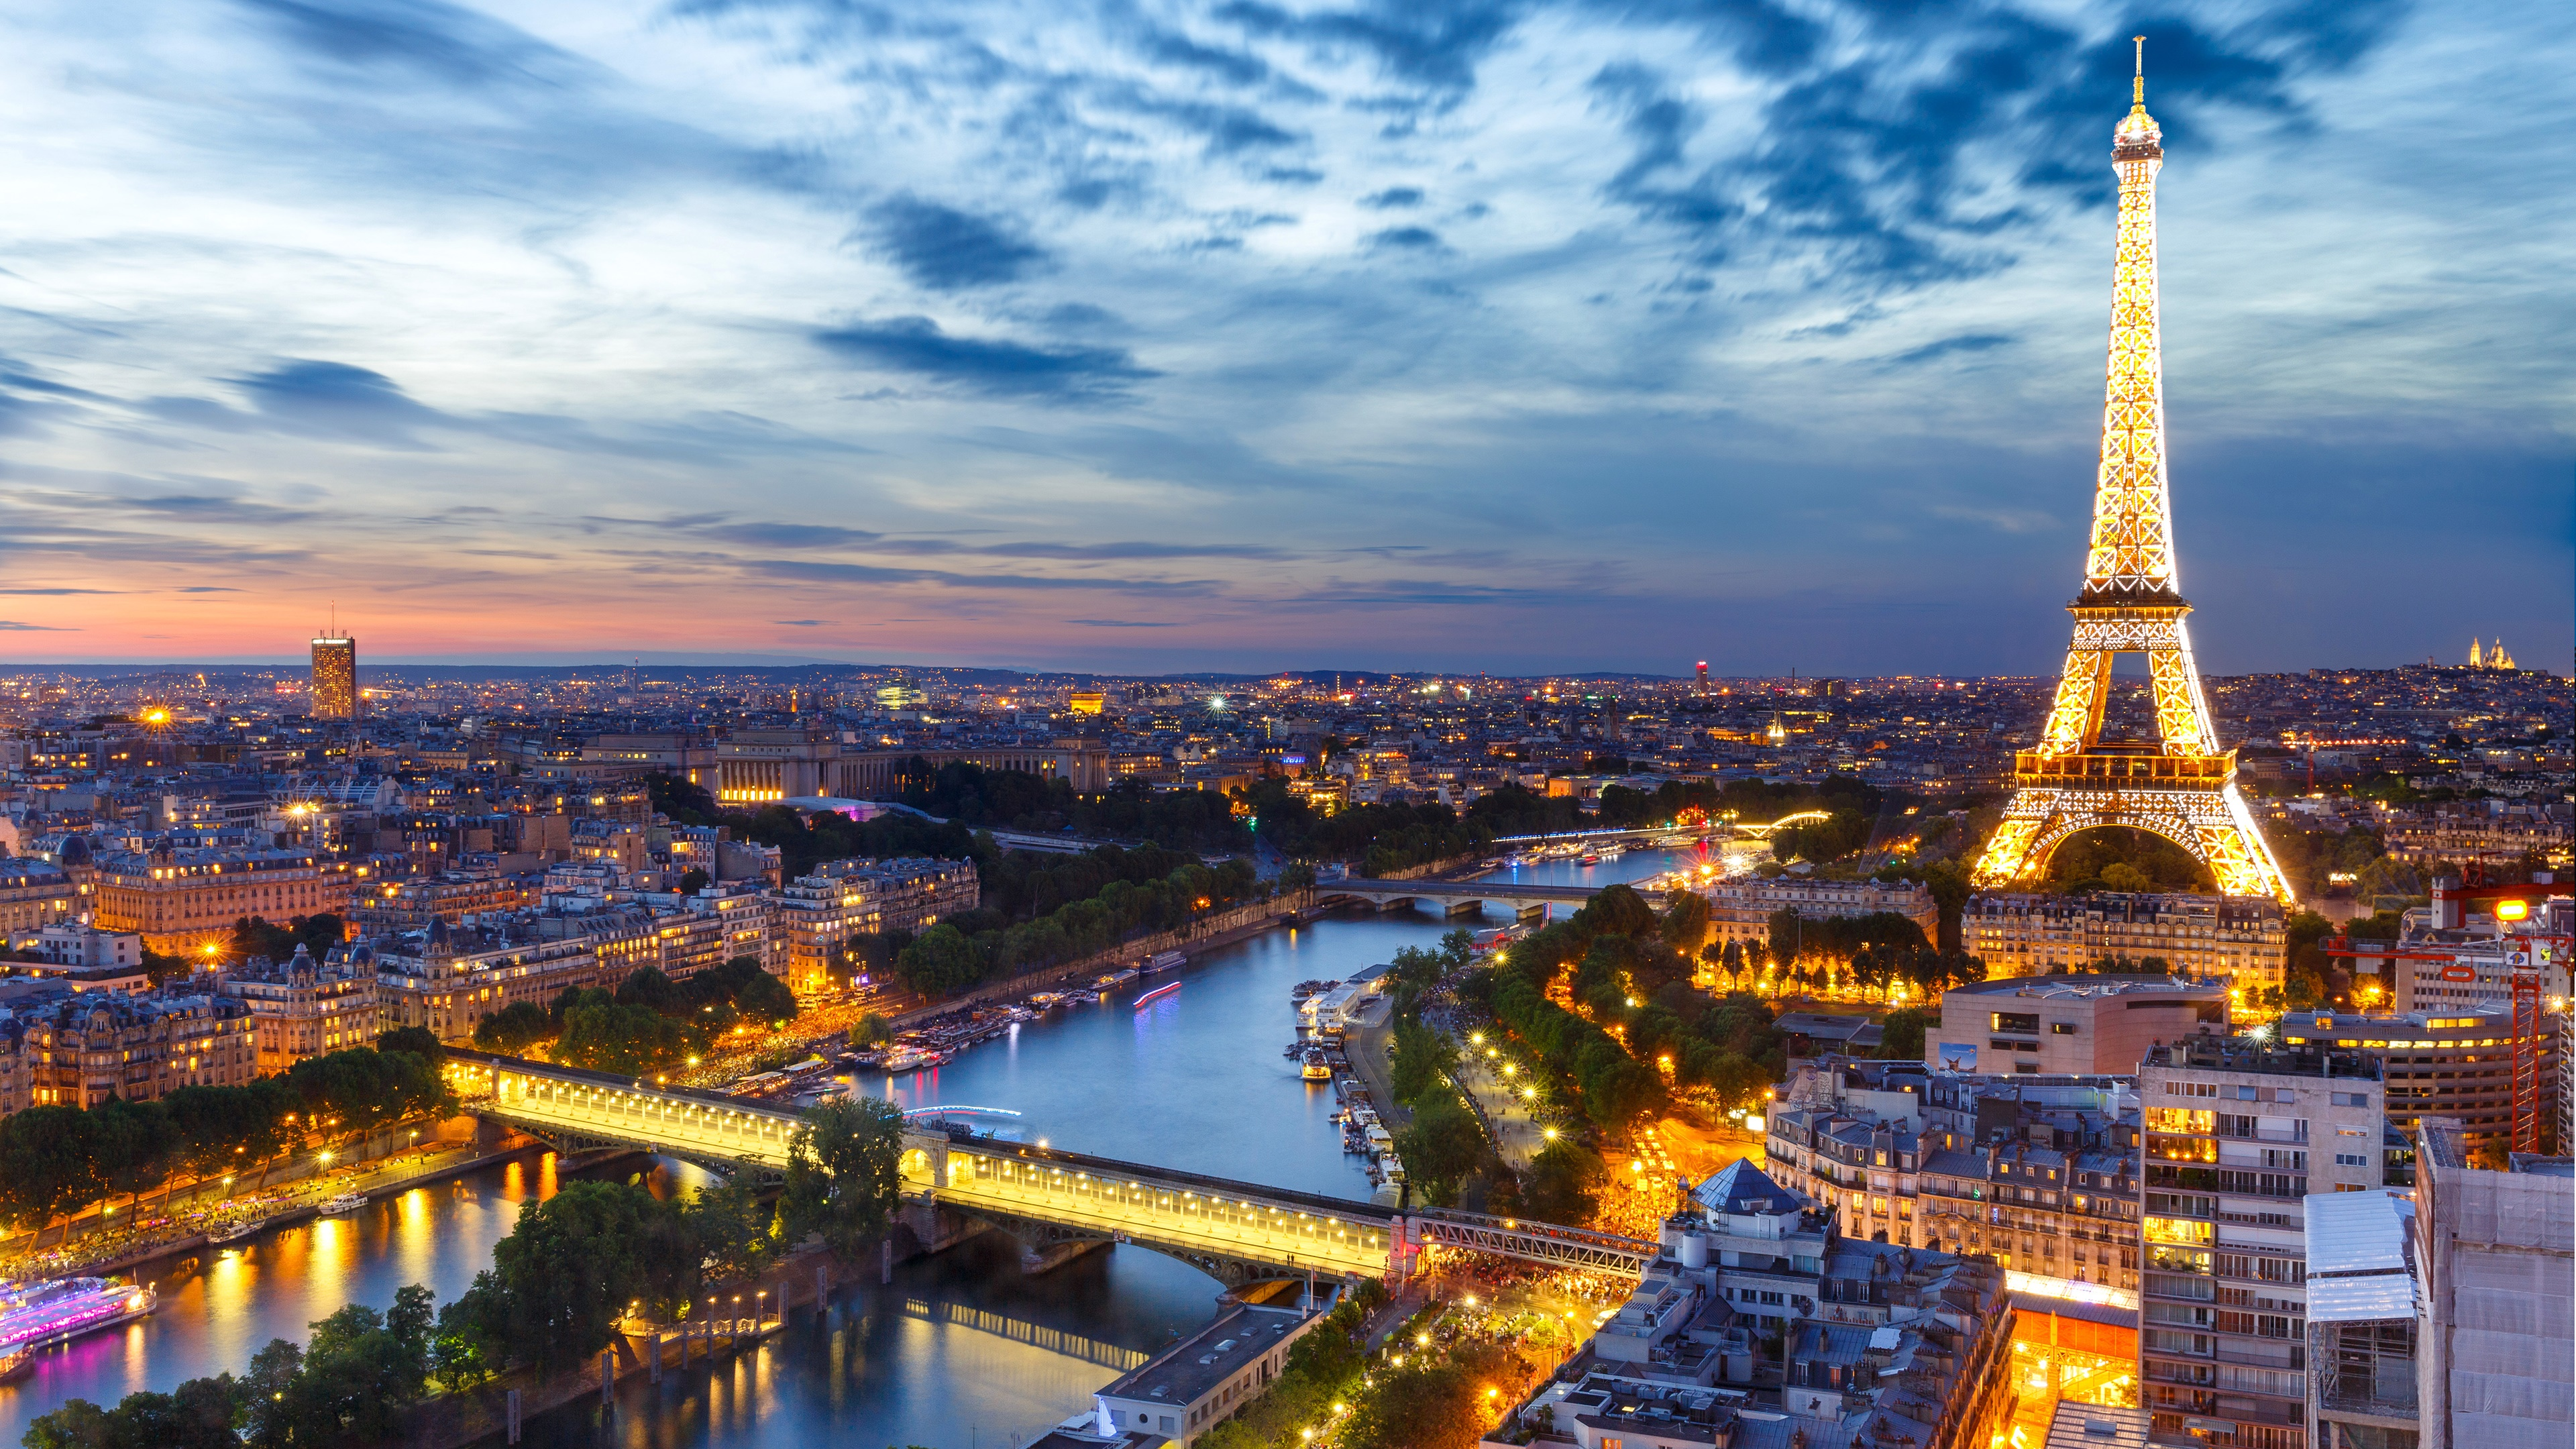 Eiffel Tower And Paris Skyline Wallpaper | Wallpaper Studio 10 ...